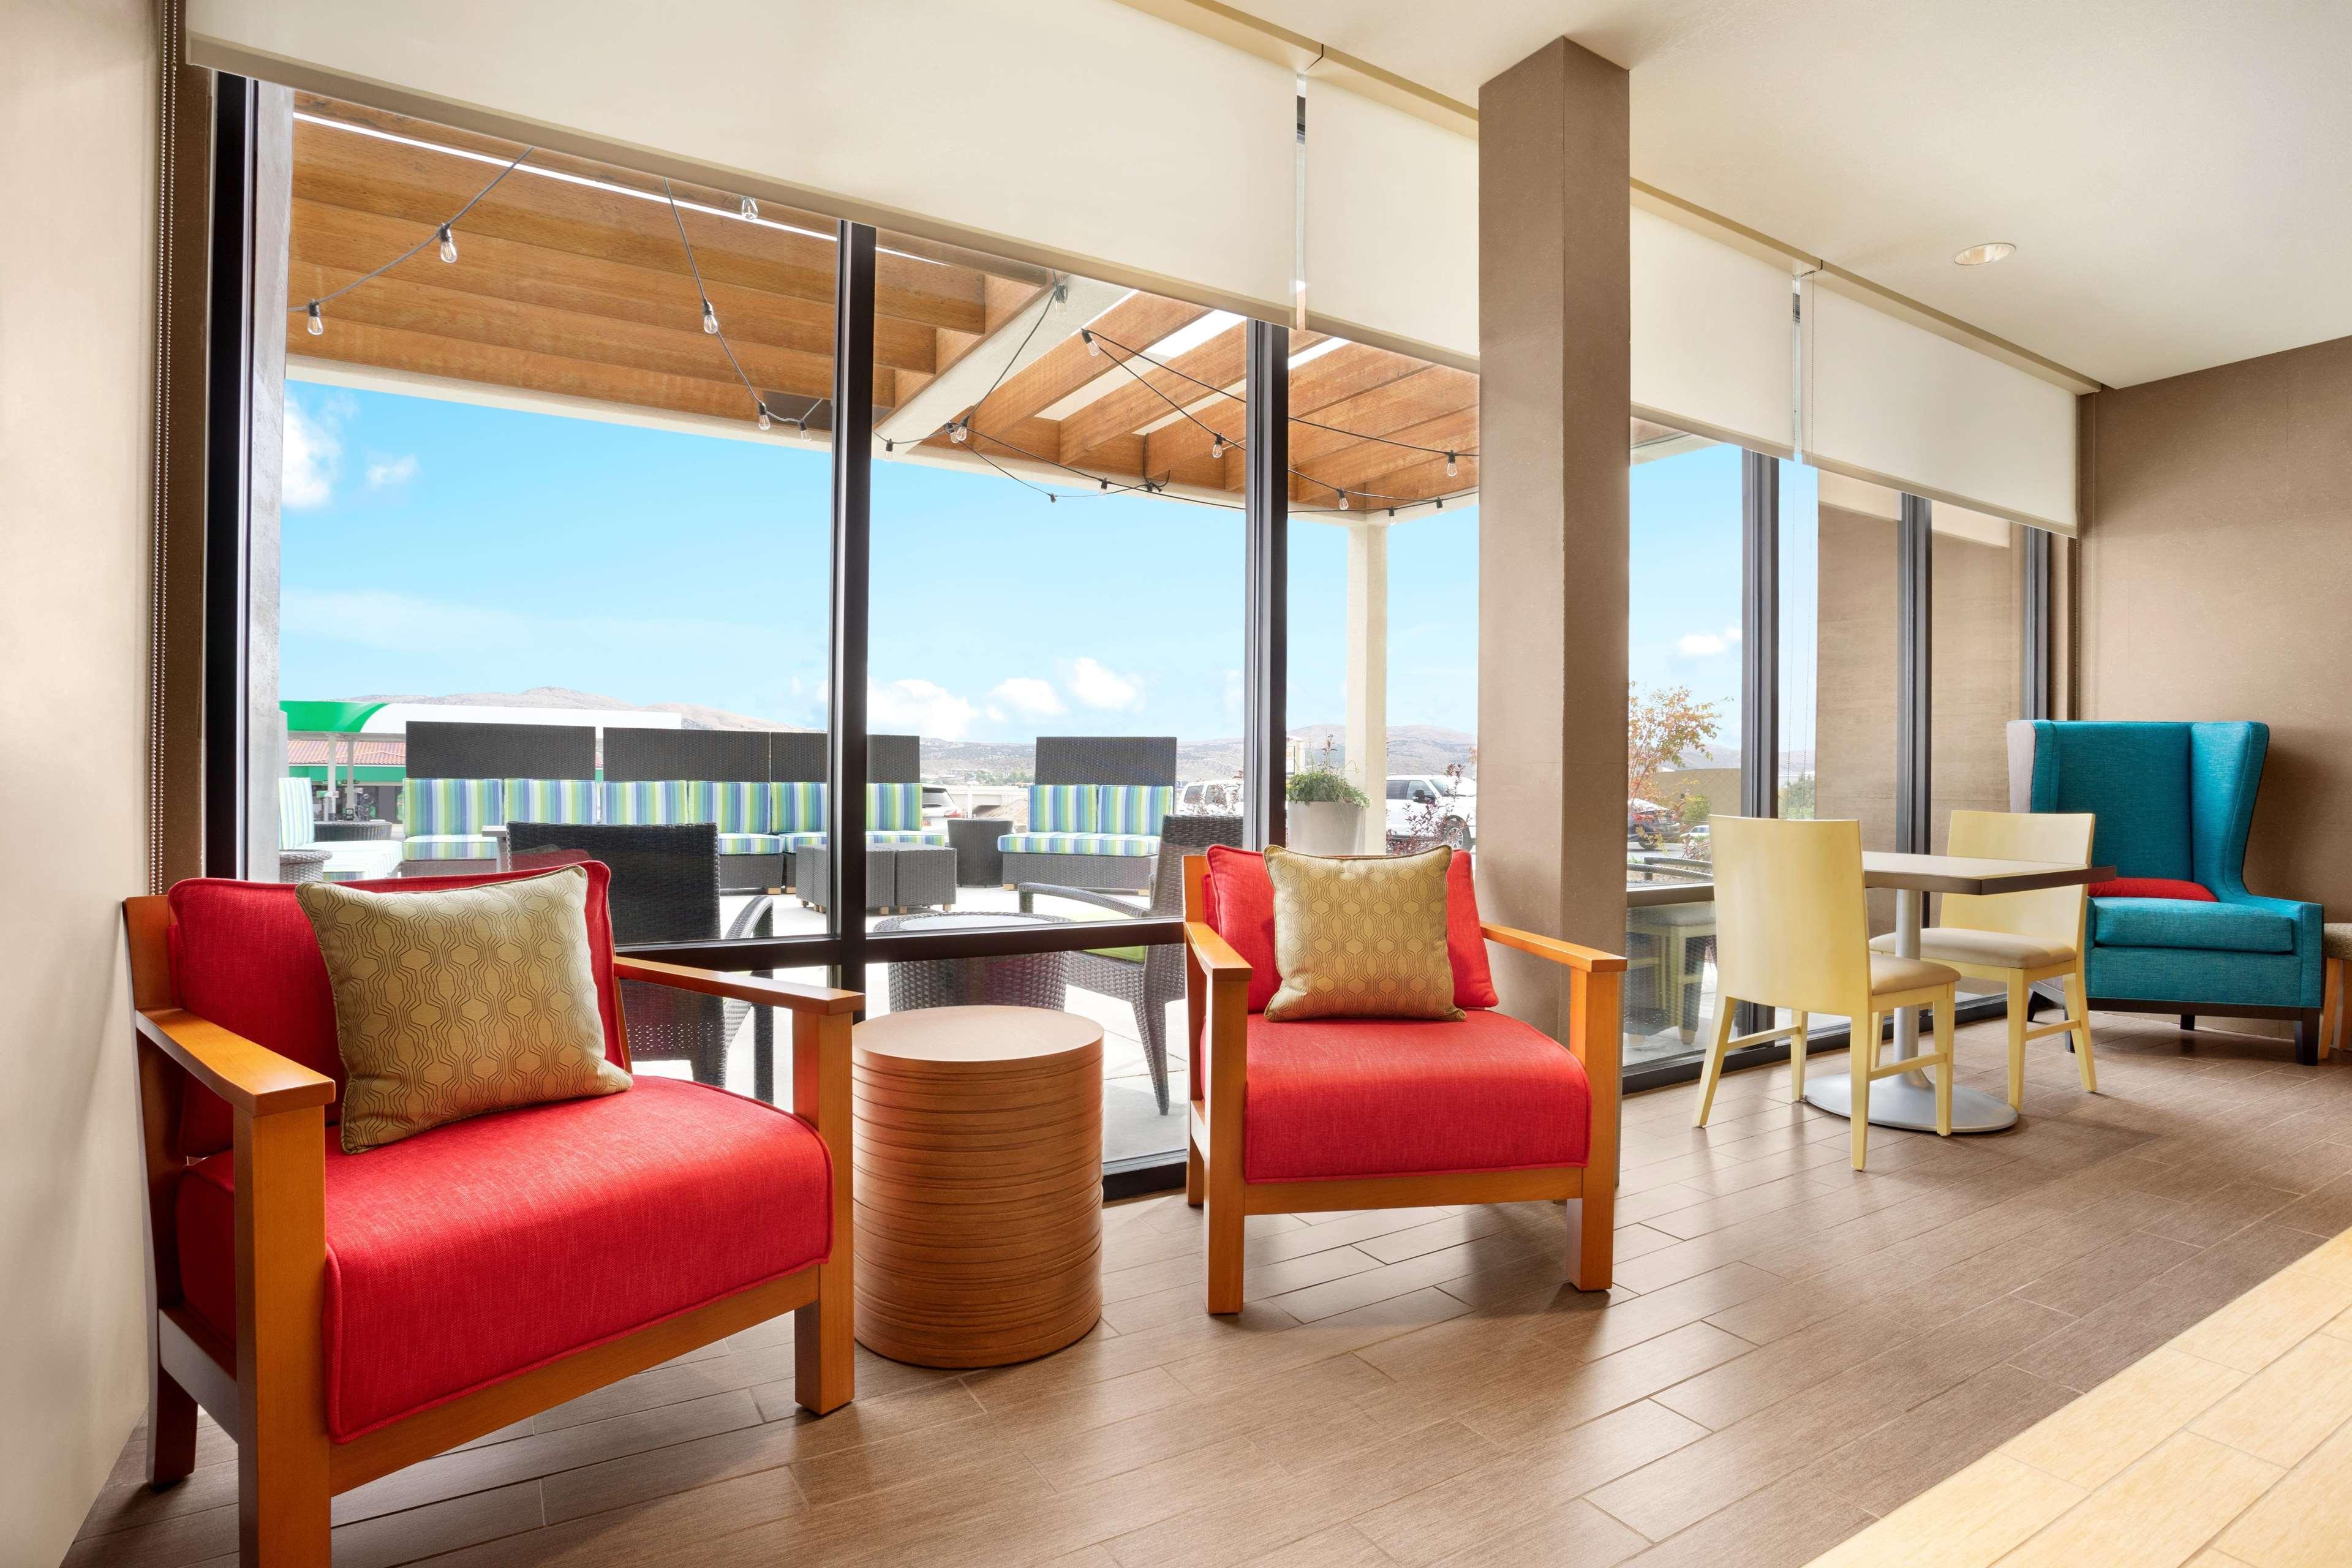 Home2 Suites by Hilton Elko image 6